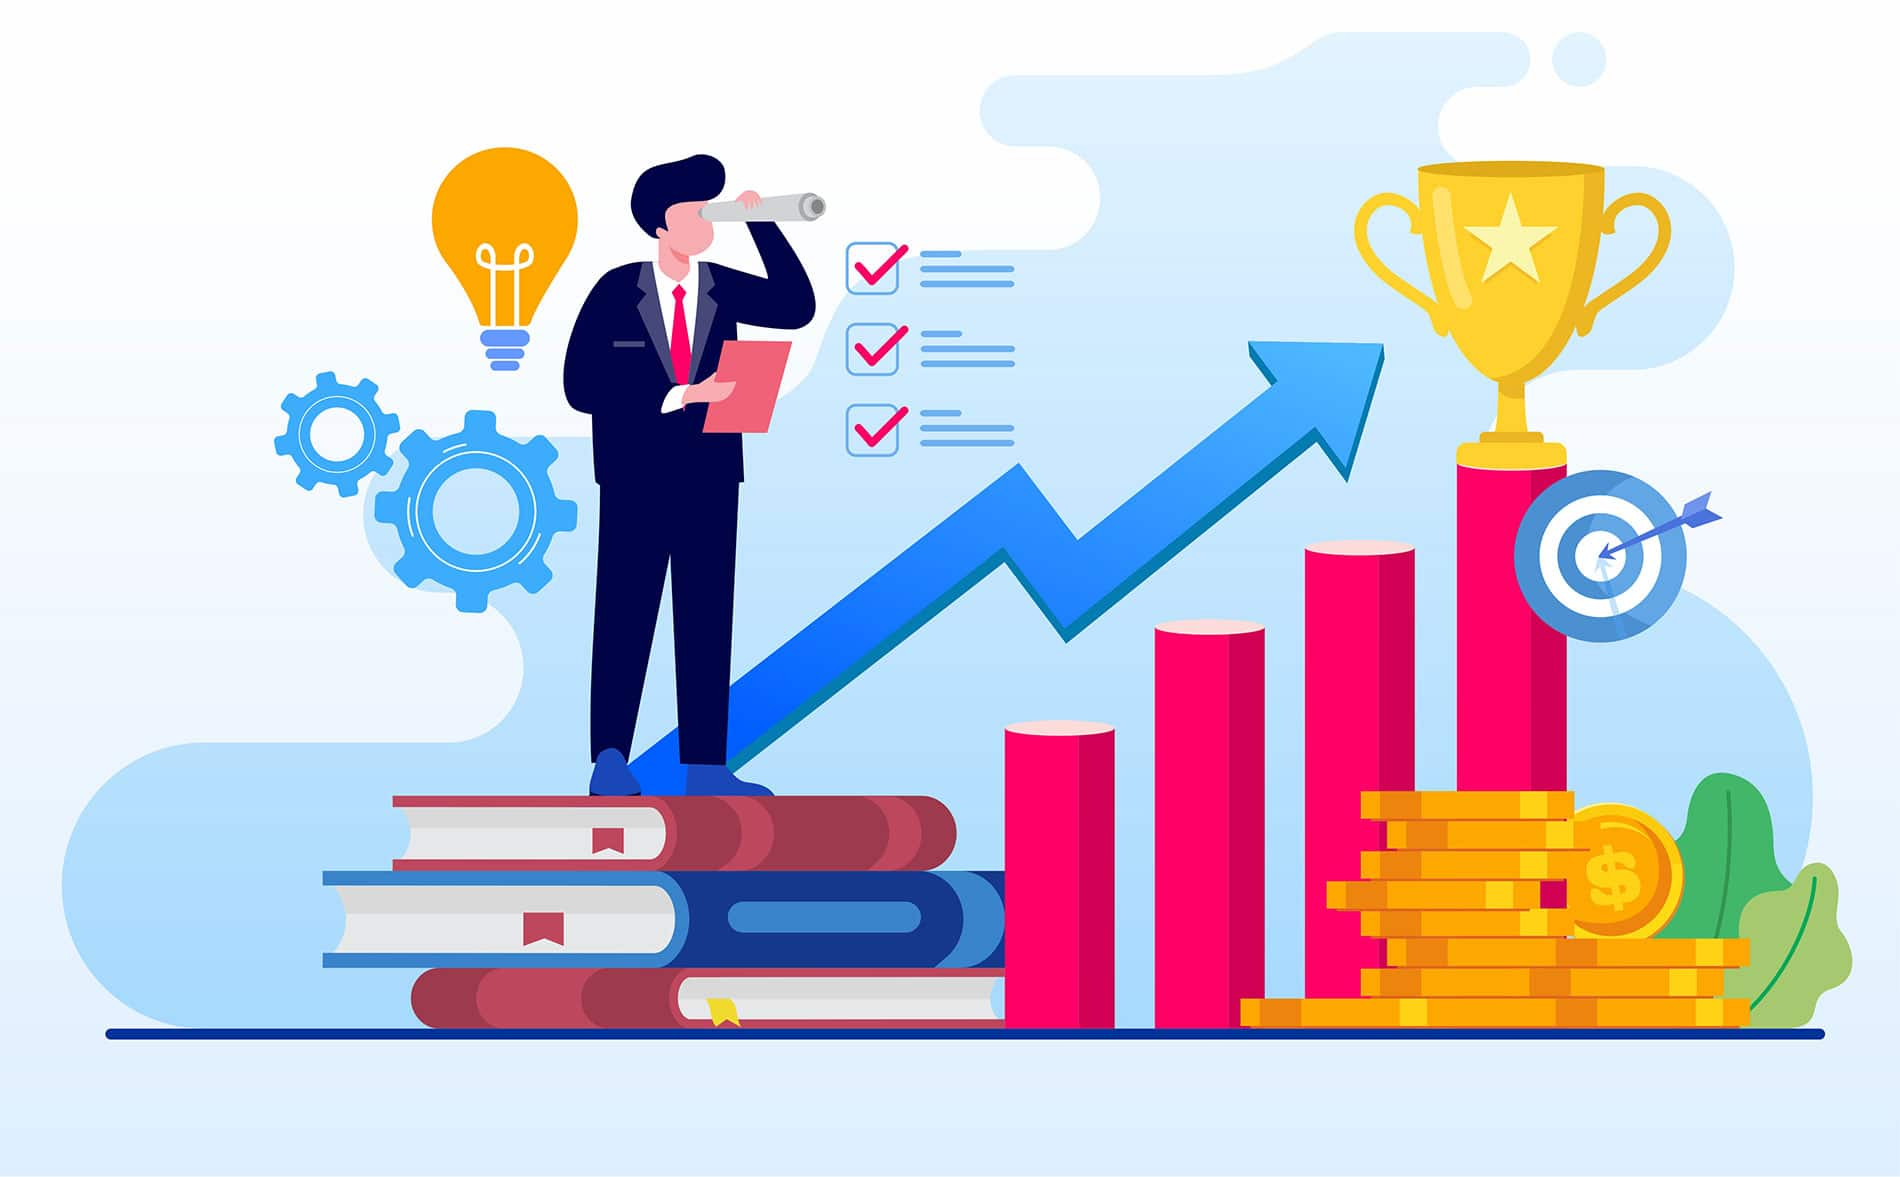 Business startup finance planning